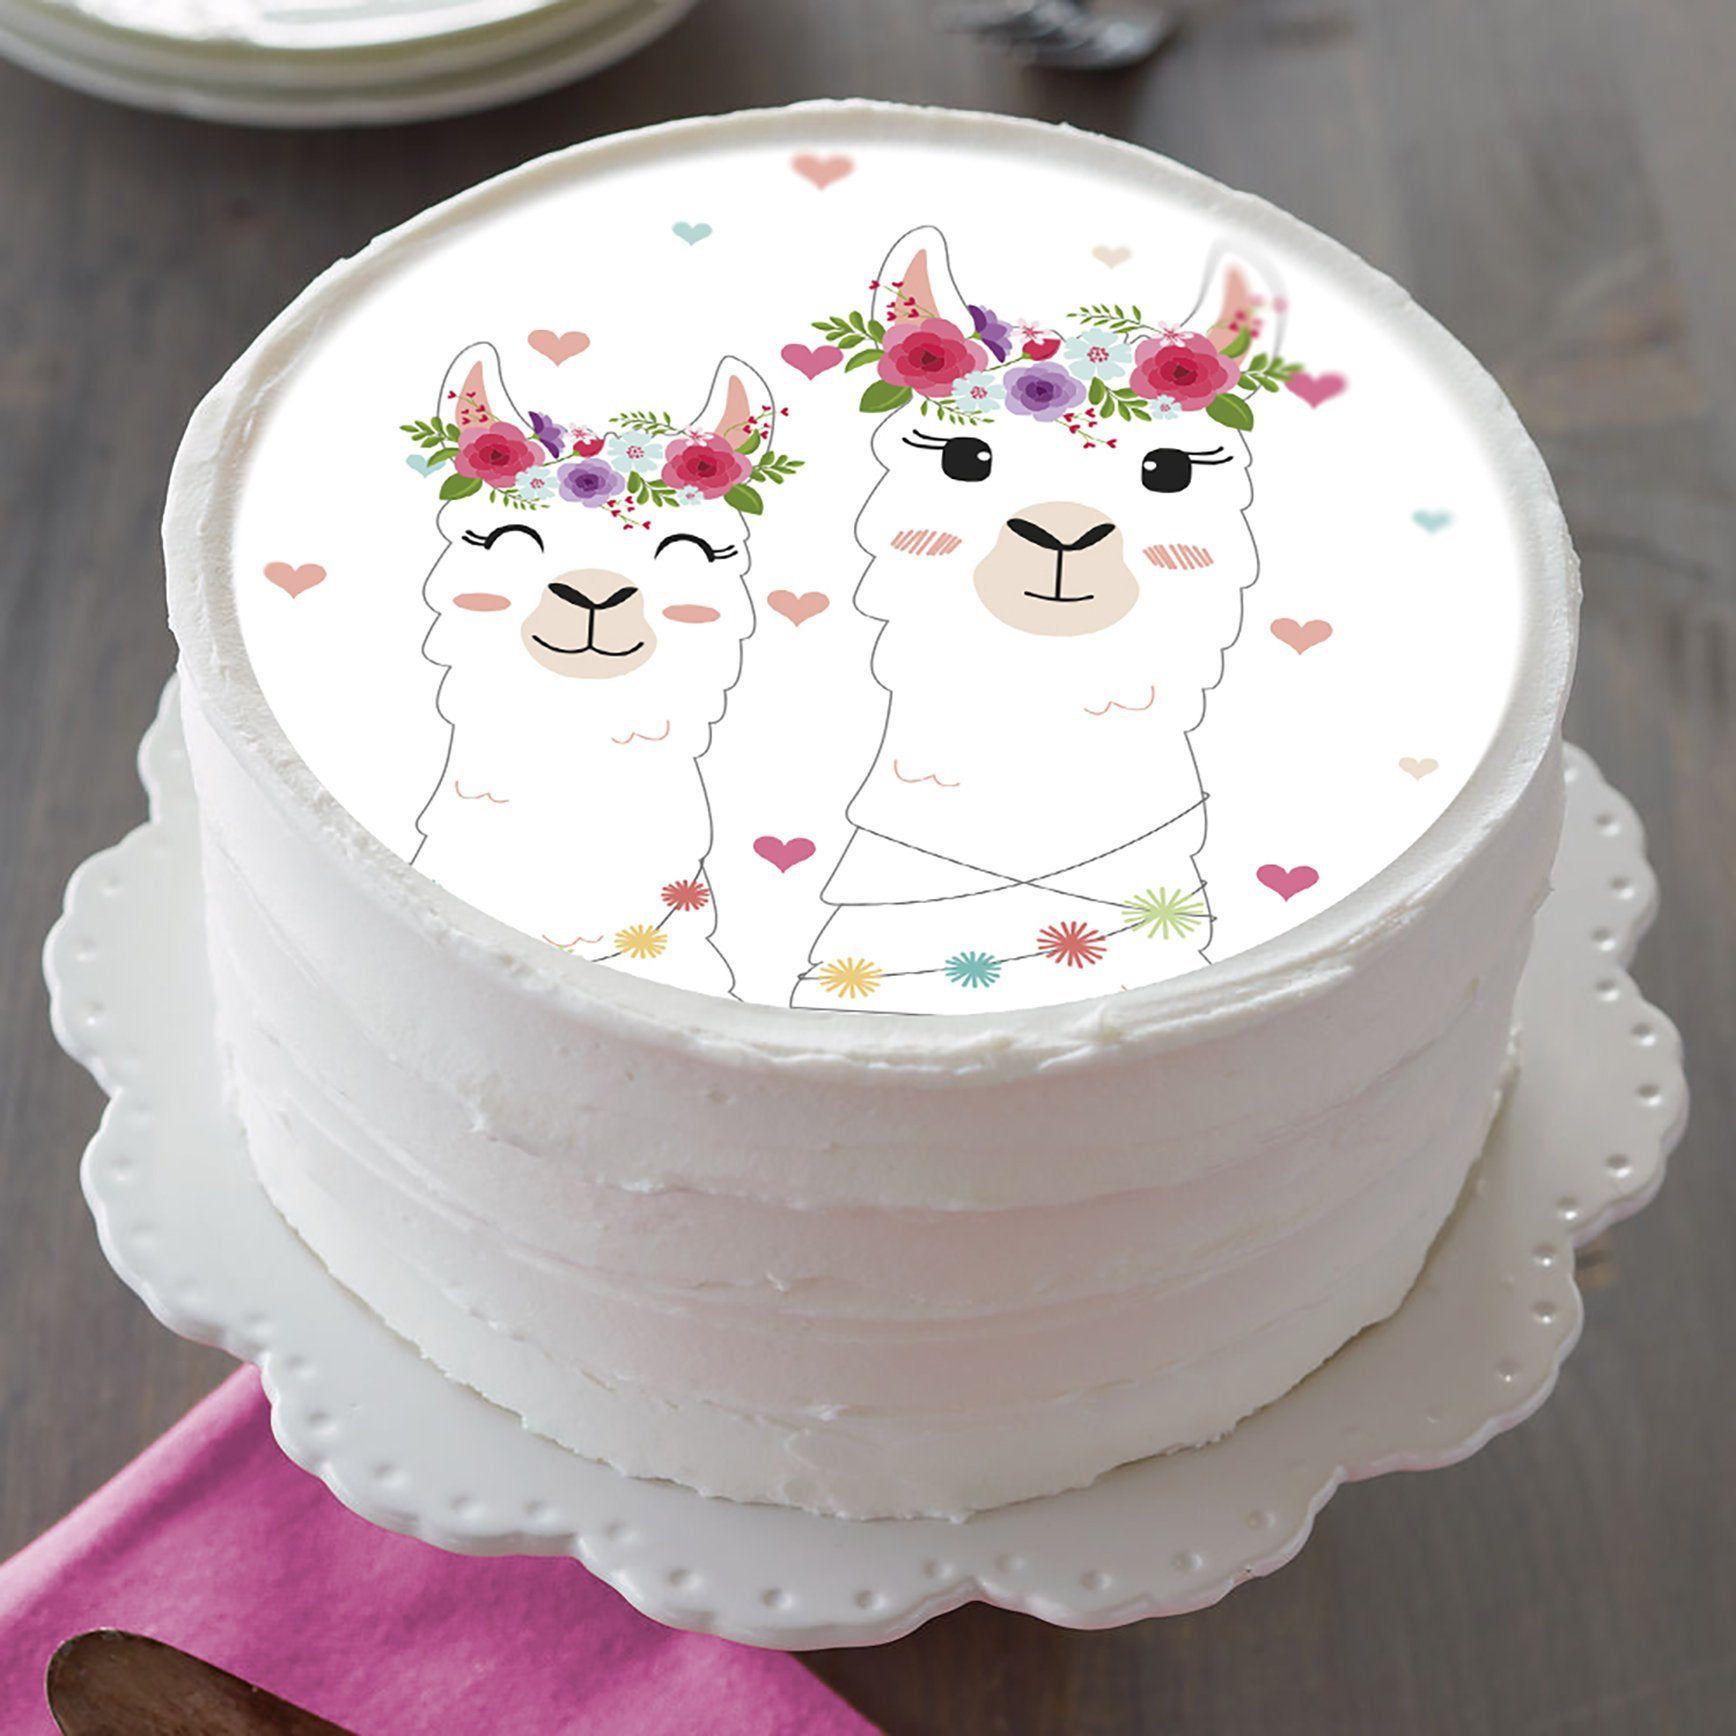 Llama image edible cake topper birthday cake topper